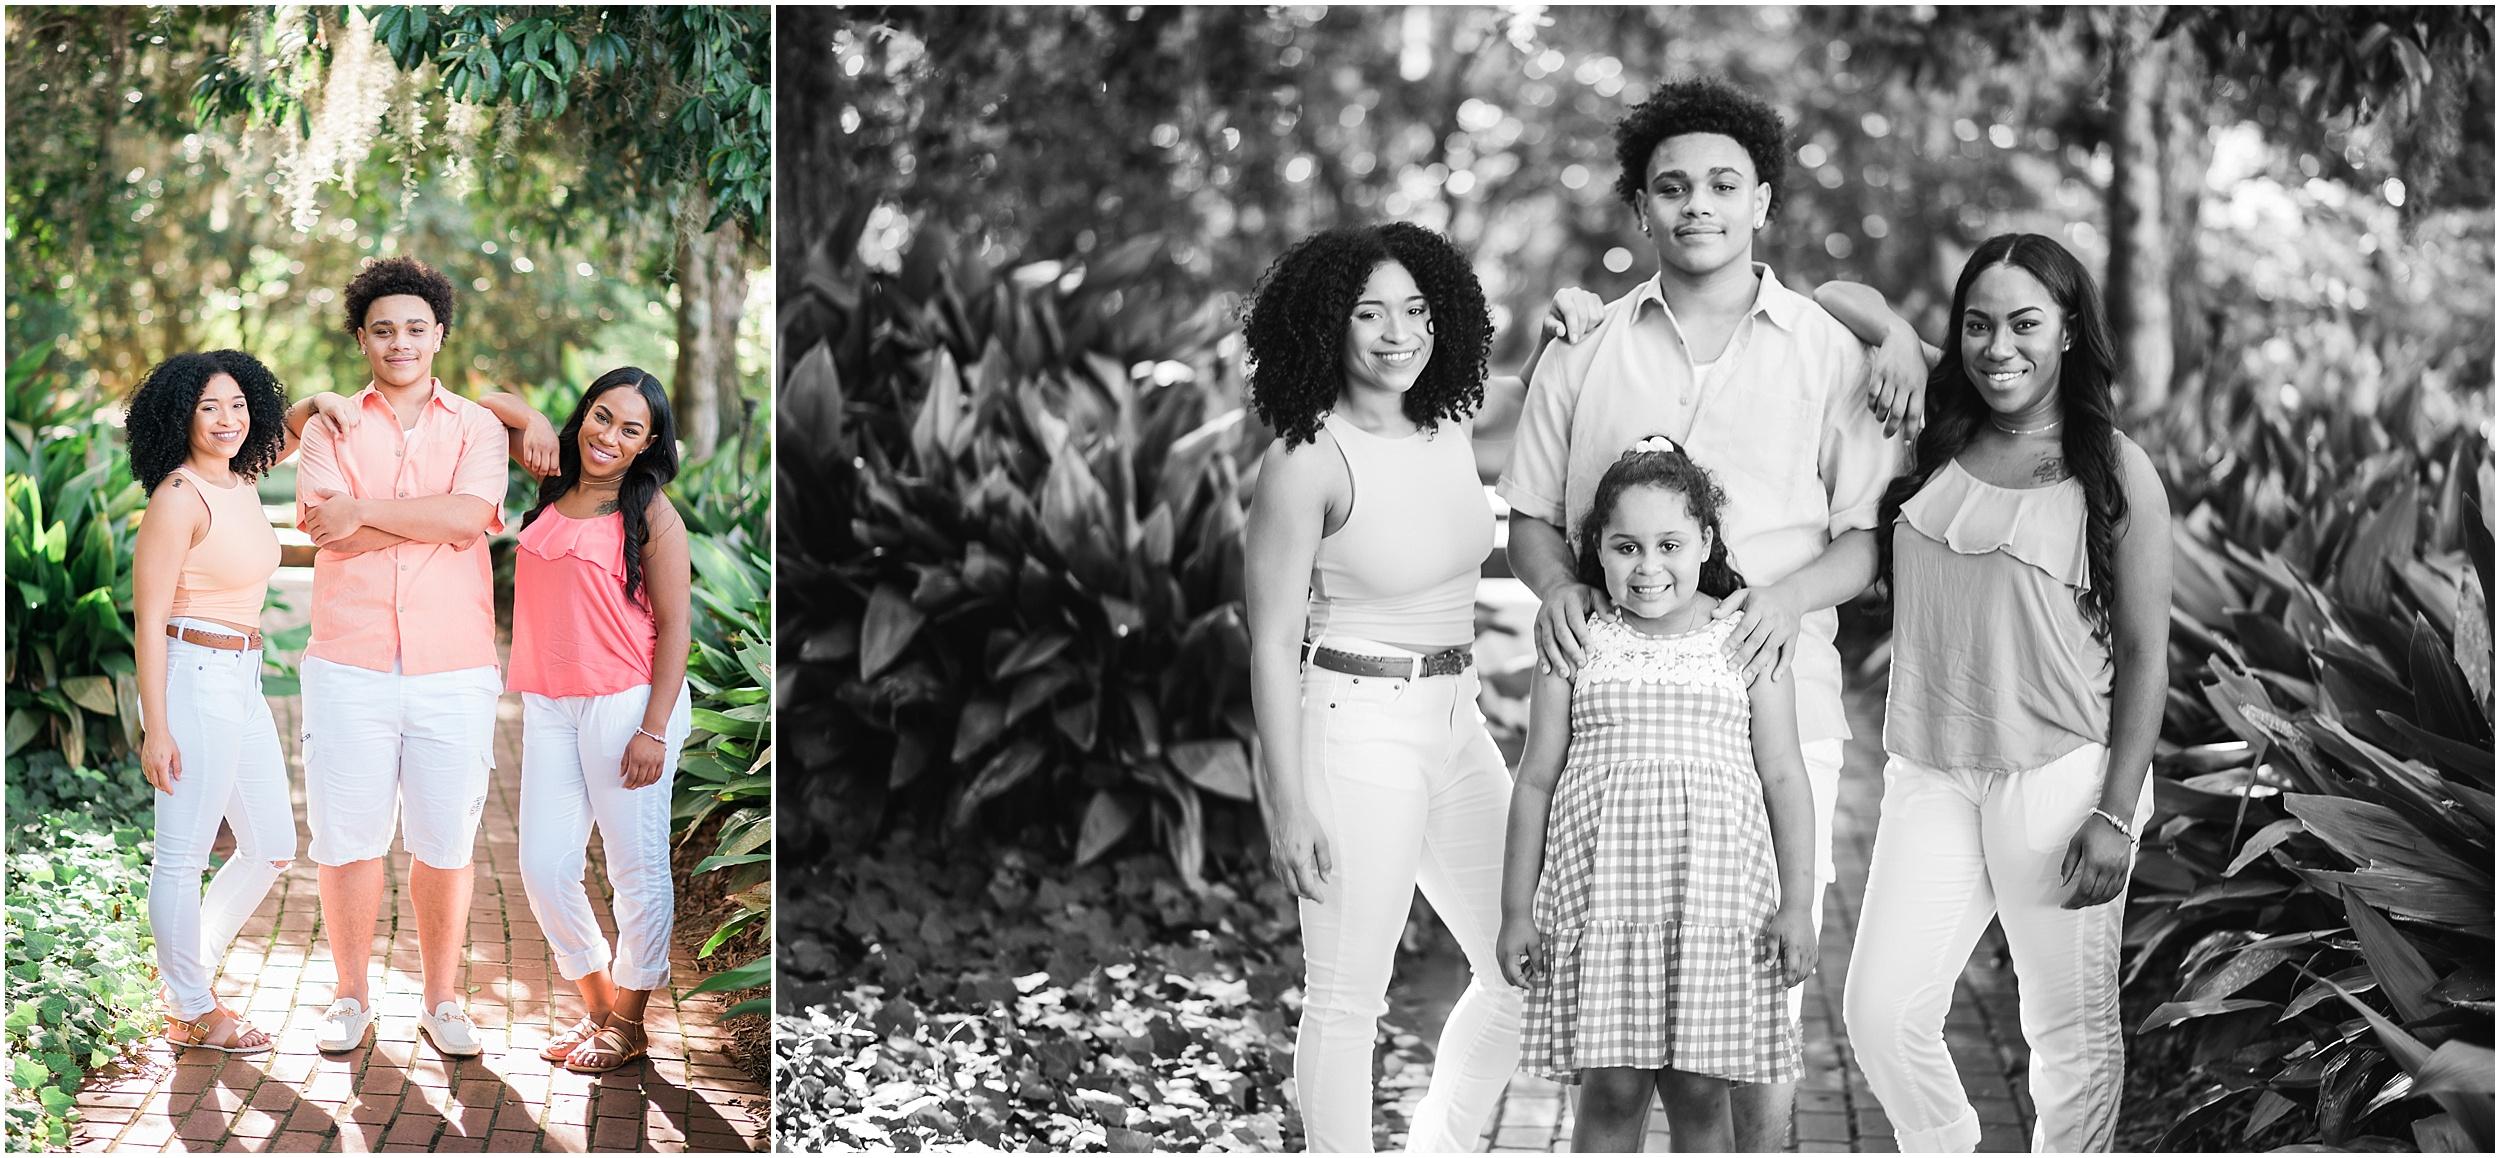 Bolden Family Session, Maclay Gardens Tallahassee Florida_0012.jpg